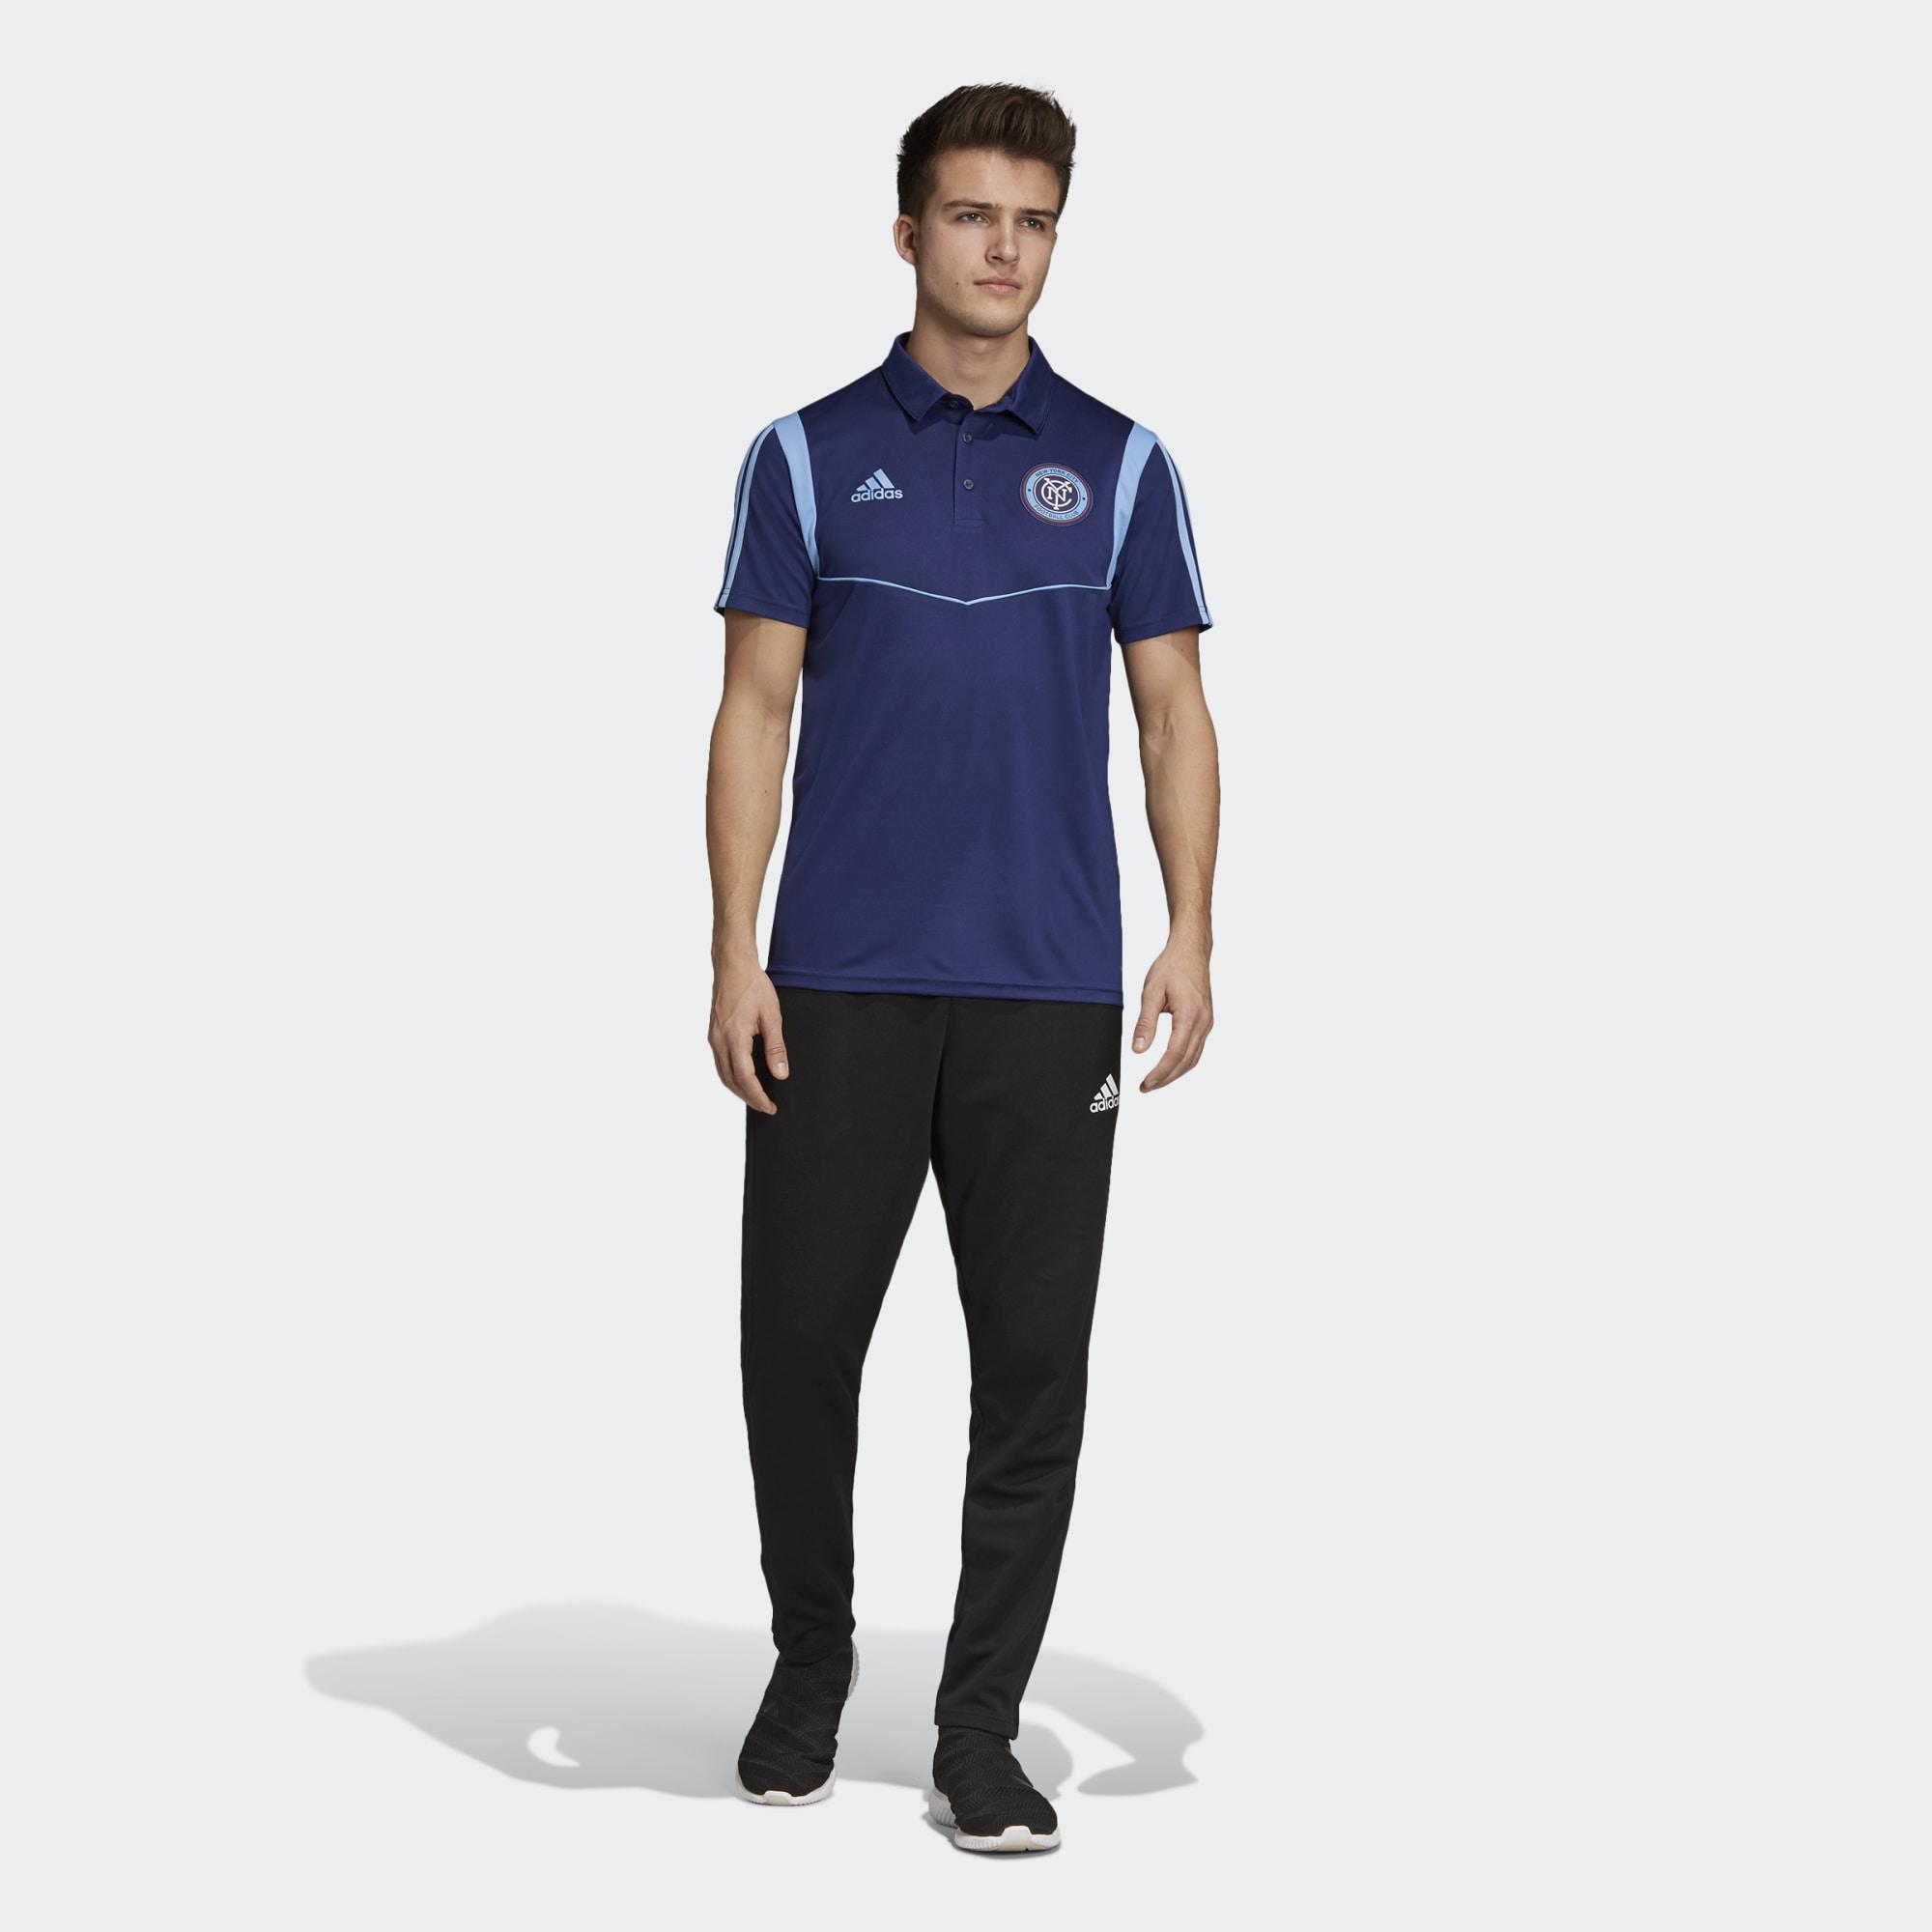 683bdde4304 ... Click to enlarge image  adidas 2019 new york city fc polo shirt night sky bahia light blue 2.jpg ...